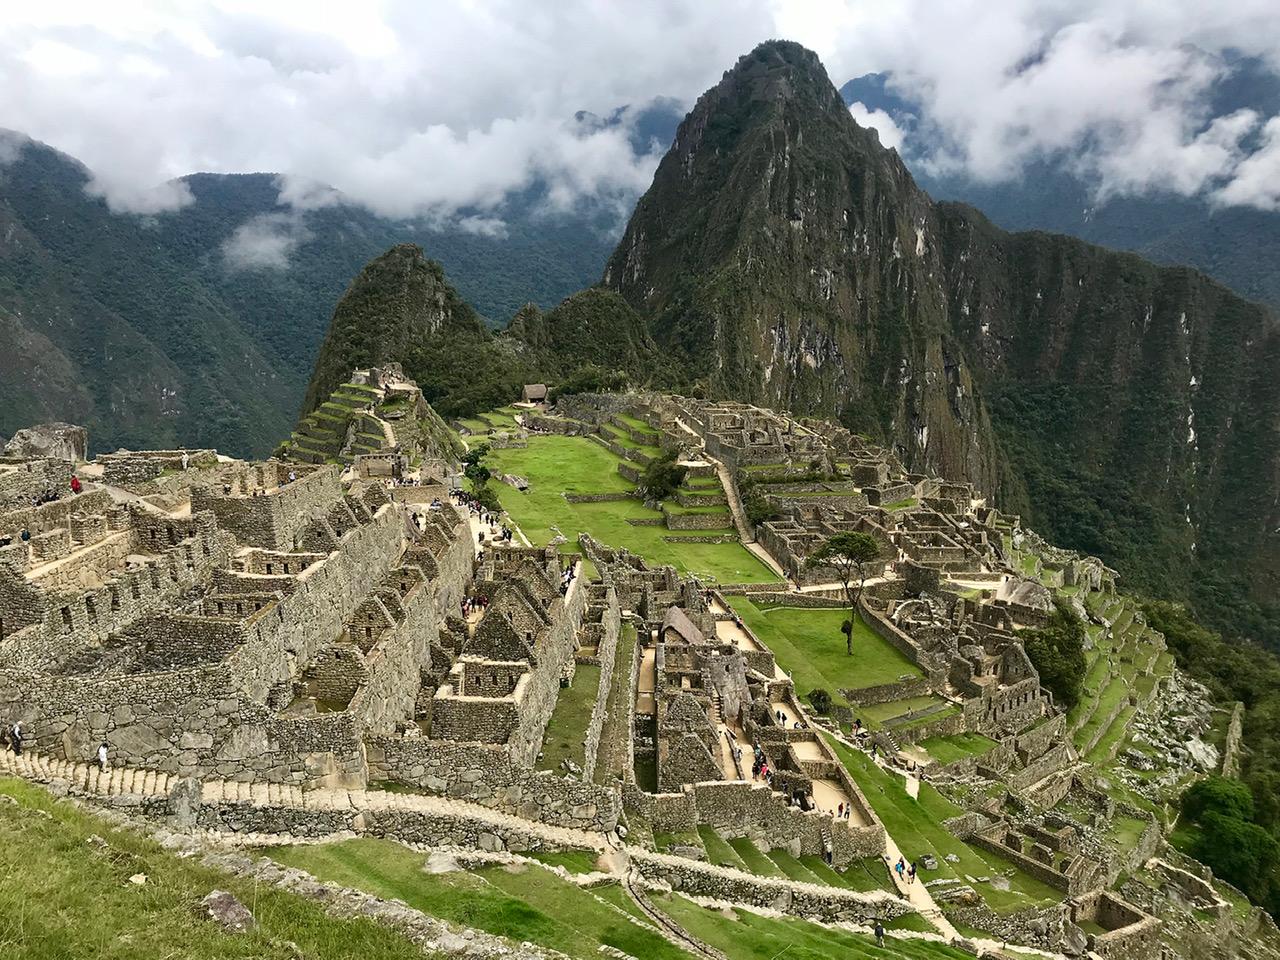 The beauty of Macchu Picchu